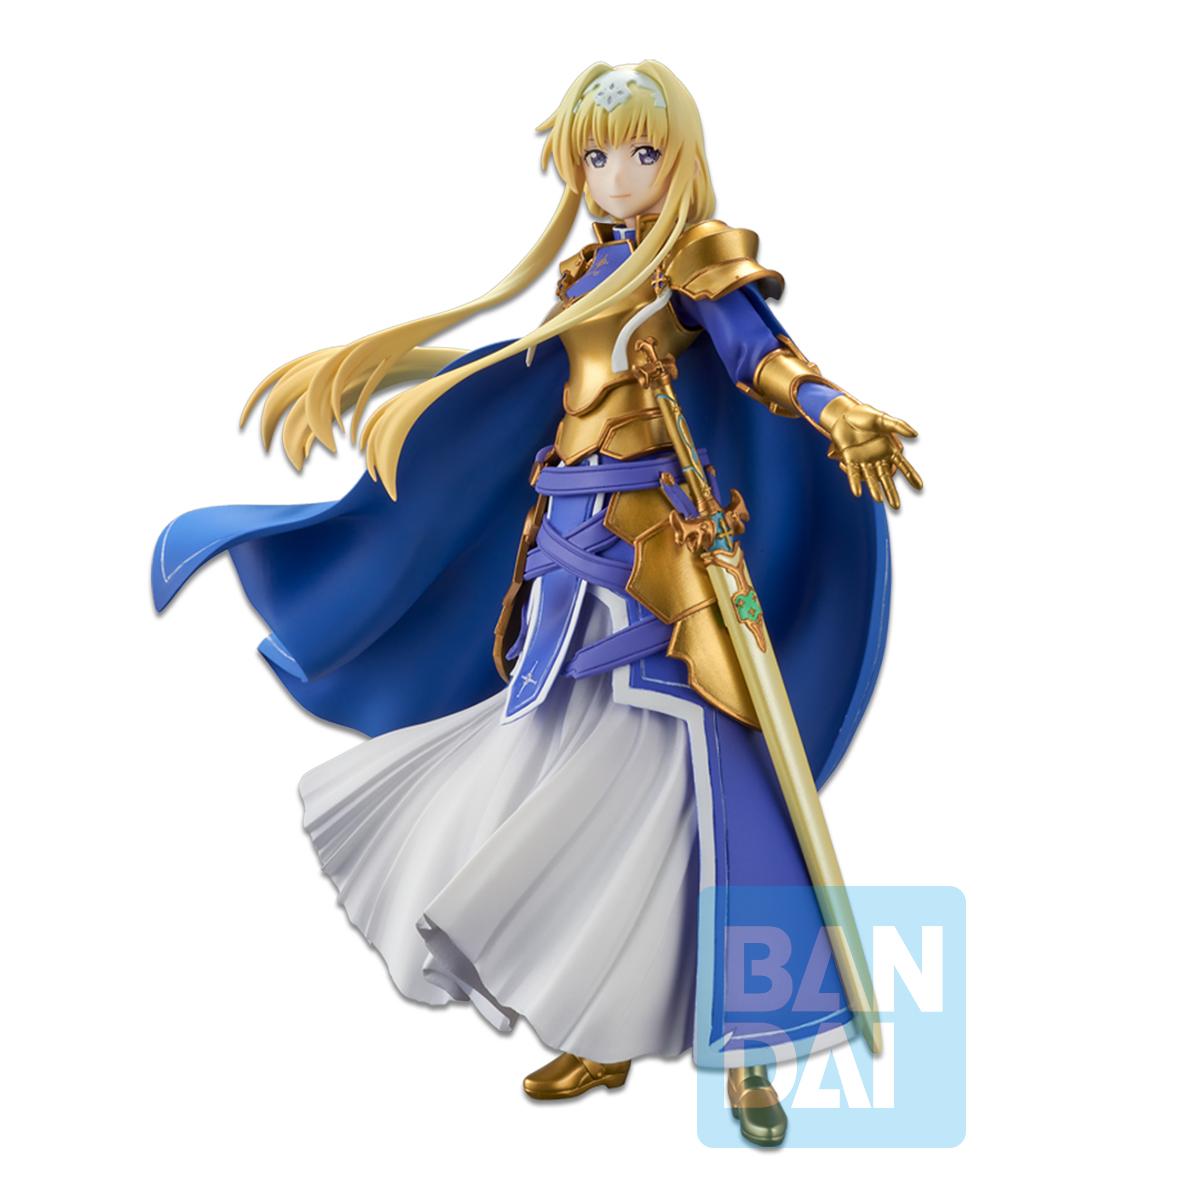 Alice Integrity Knight Ver Sword Art Online Alicization Ichiban Figure